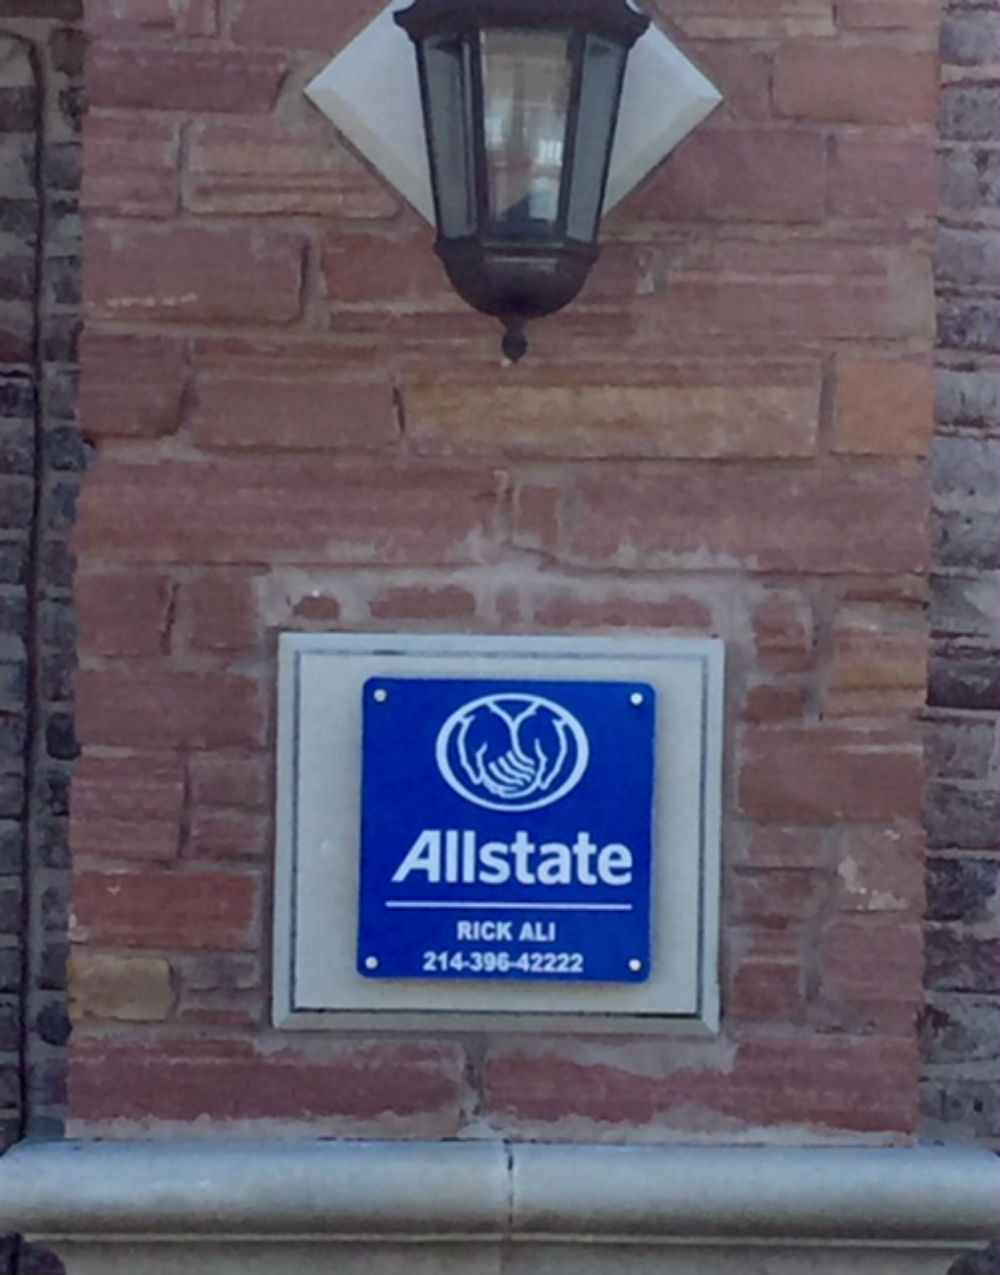 Allstate Insurance Agent: Rick Ali image 3